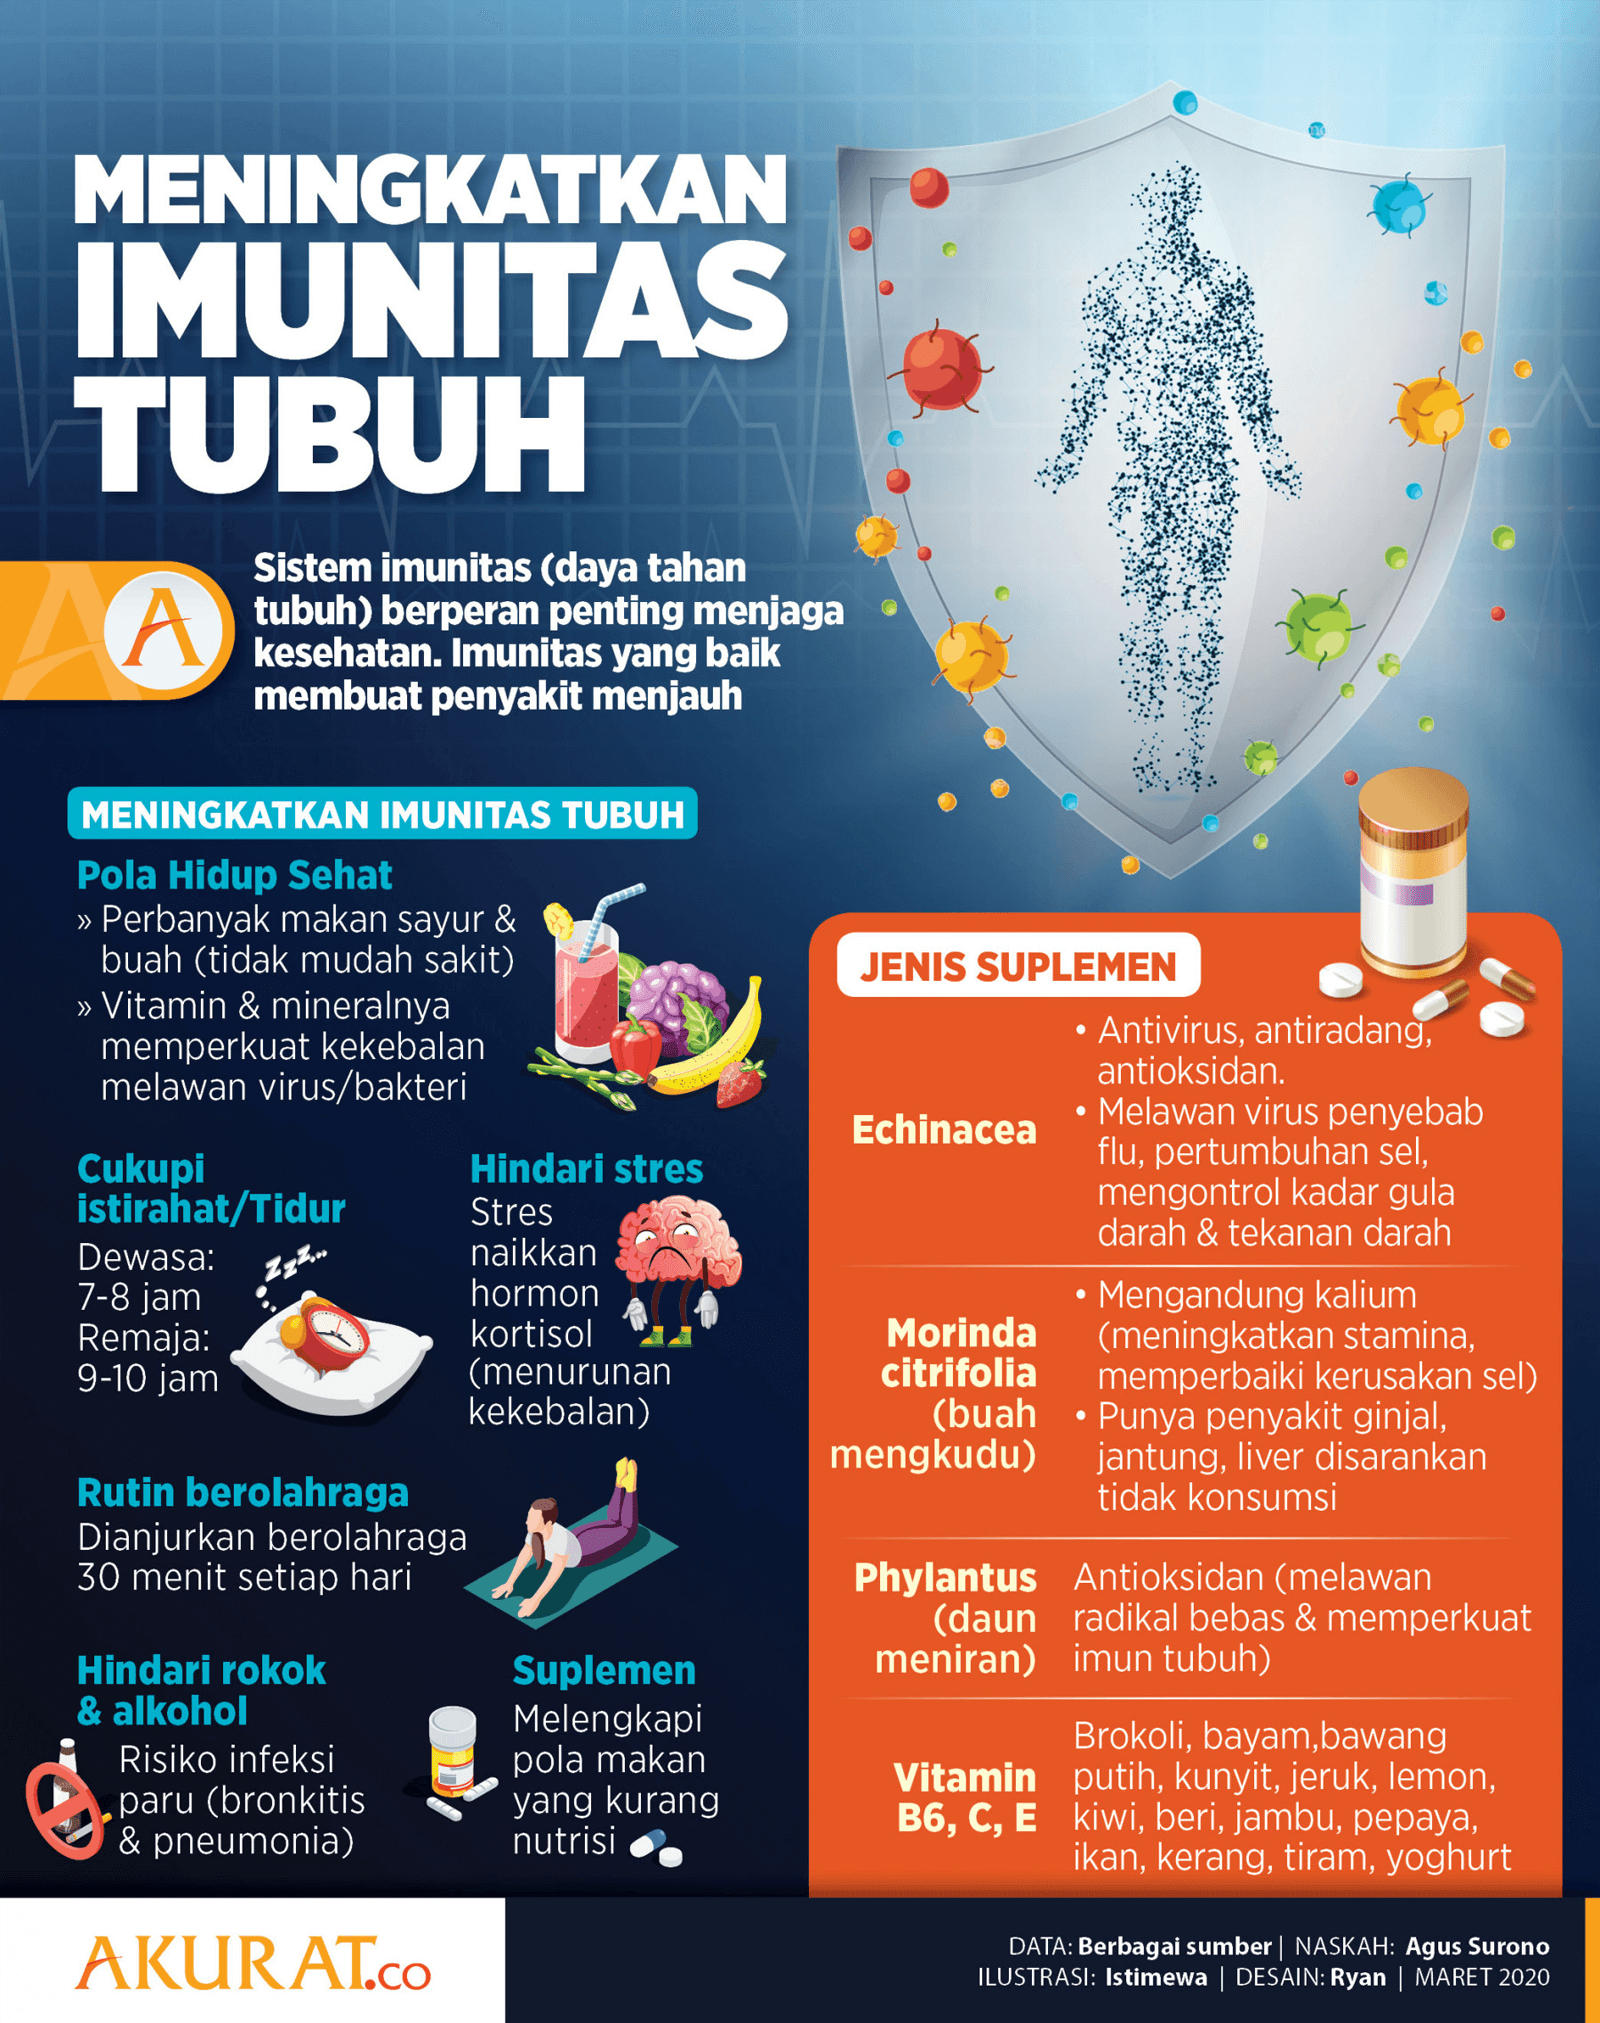 Tips Jaga Dayan Tubuh Imunitas Tubuh